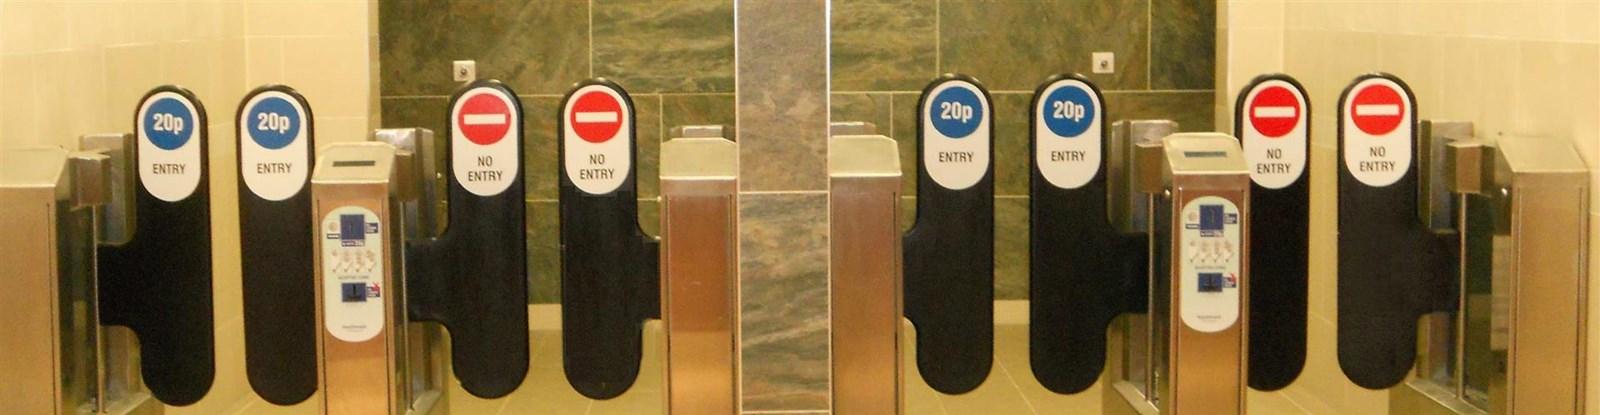 public toilet operations